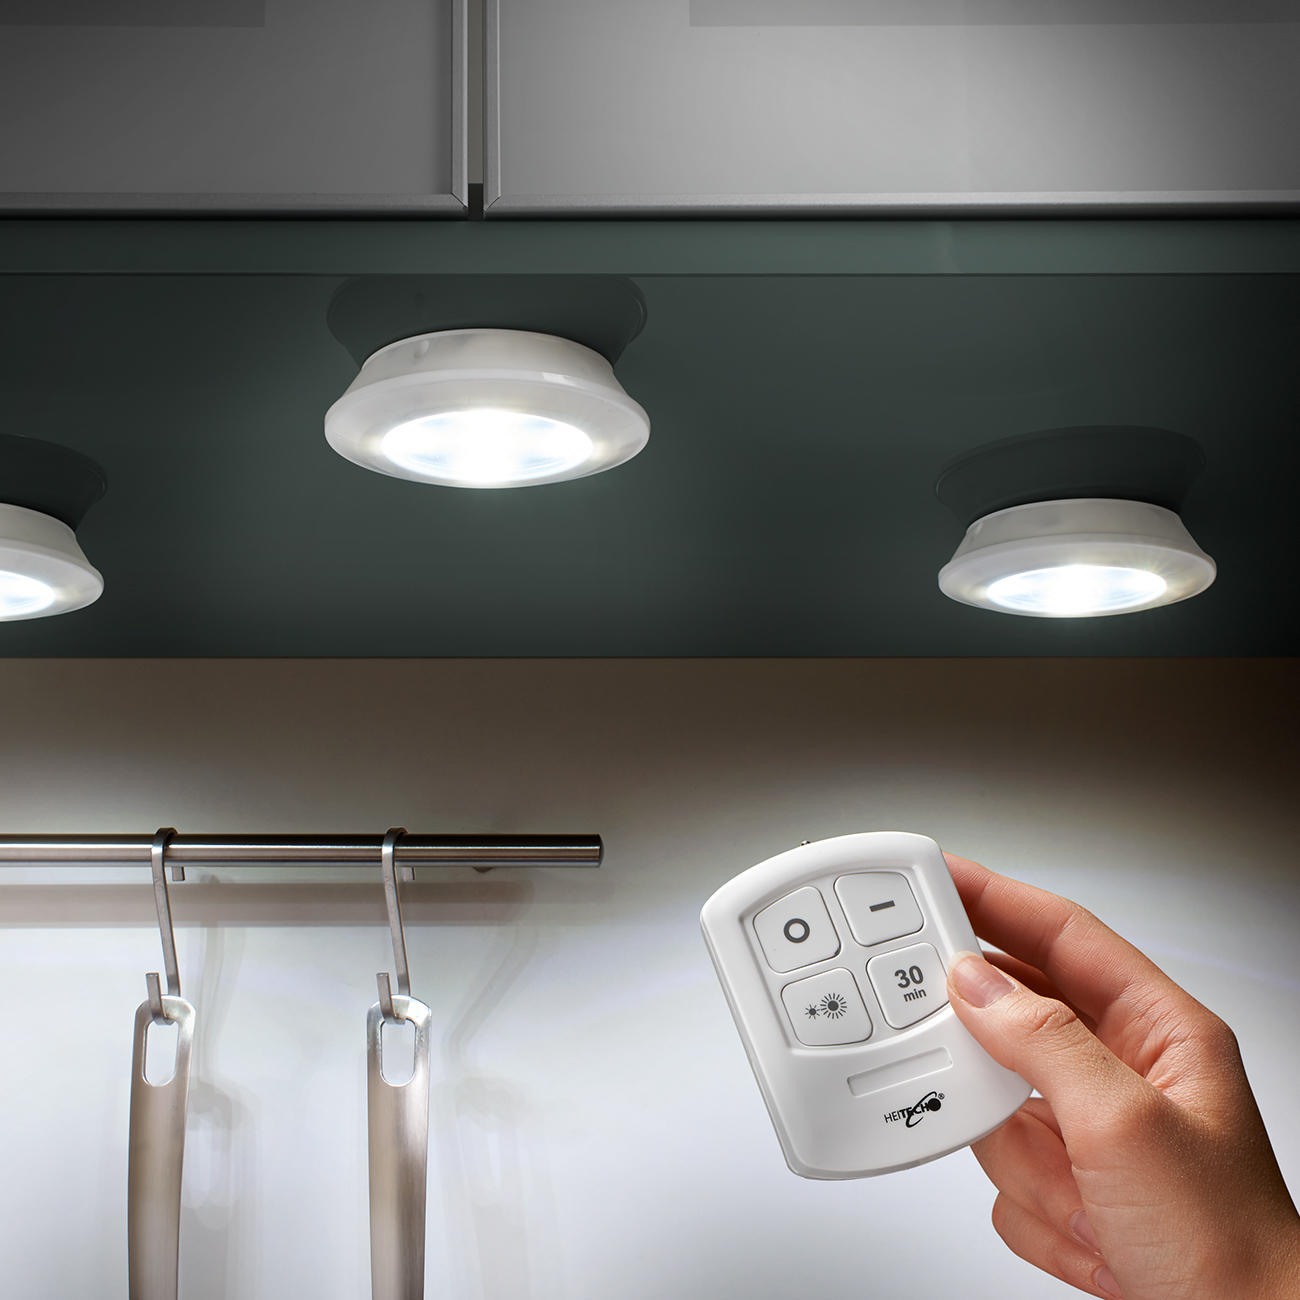 draadloze led verlichting 3 delig online kopen. Black Bedroom Furniture Sets. Home Design Ideas